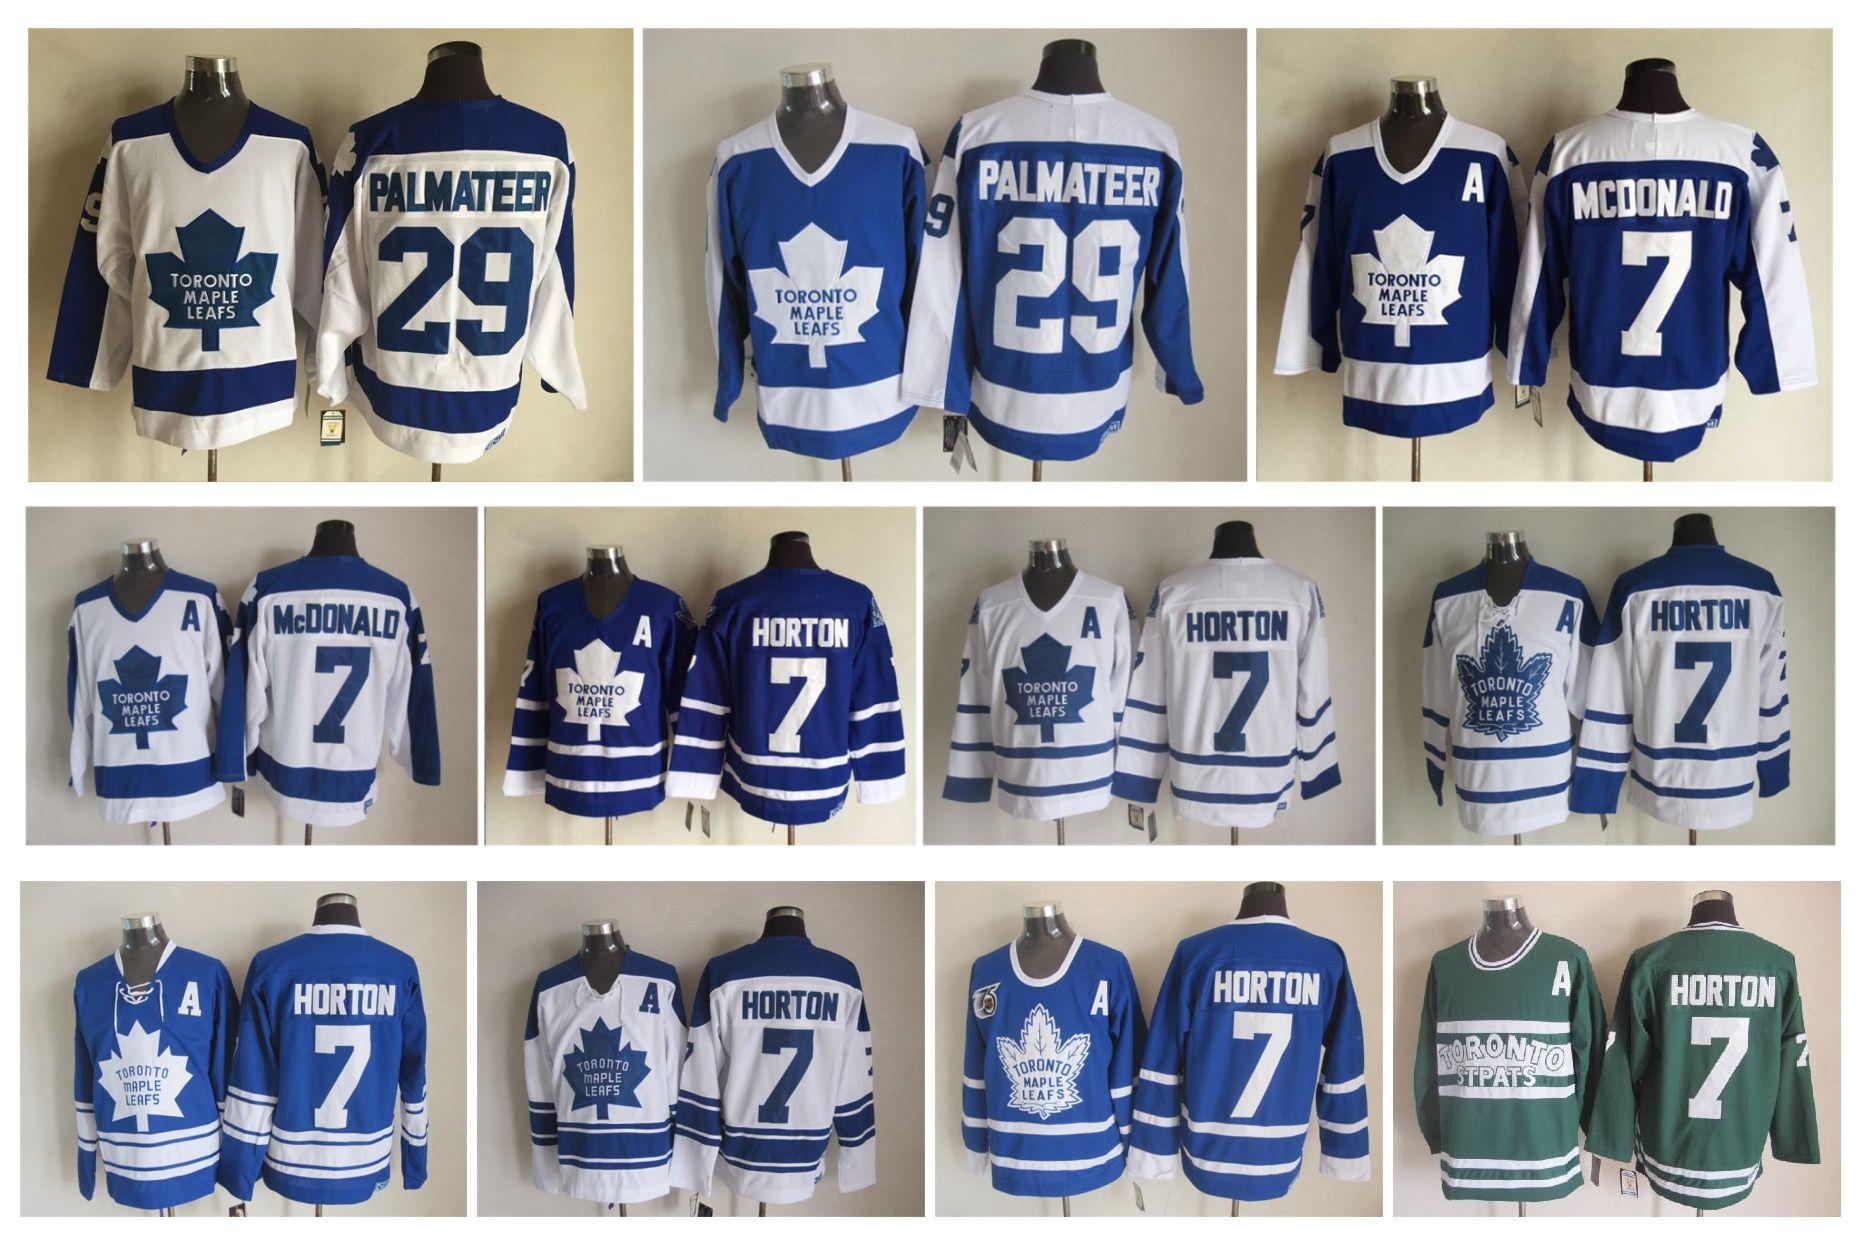 Retro Toronto Maple Leafs Hockey Jersey 7 Tim Horton 7 Lanny McDonald 29 Mike Palmateer Vintage CCM Authentic Stitched Jerseys